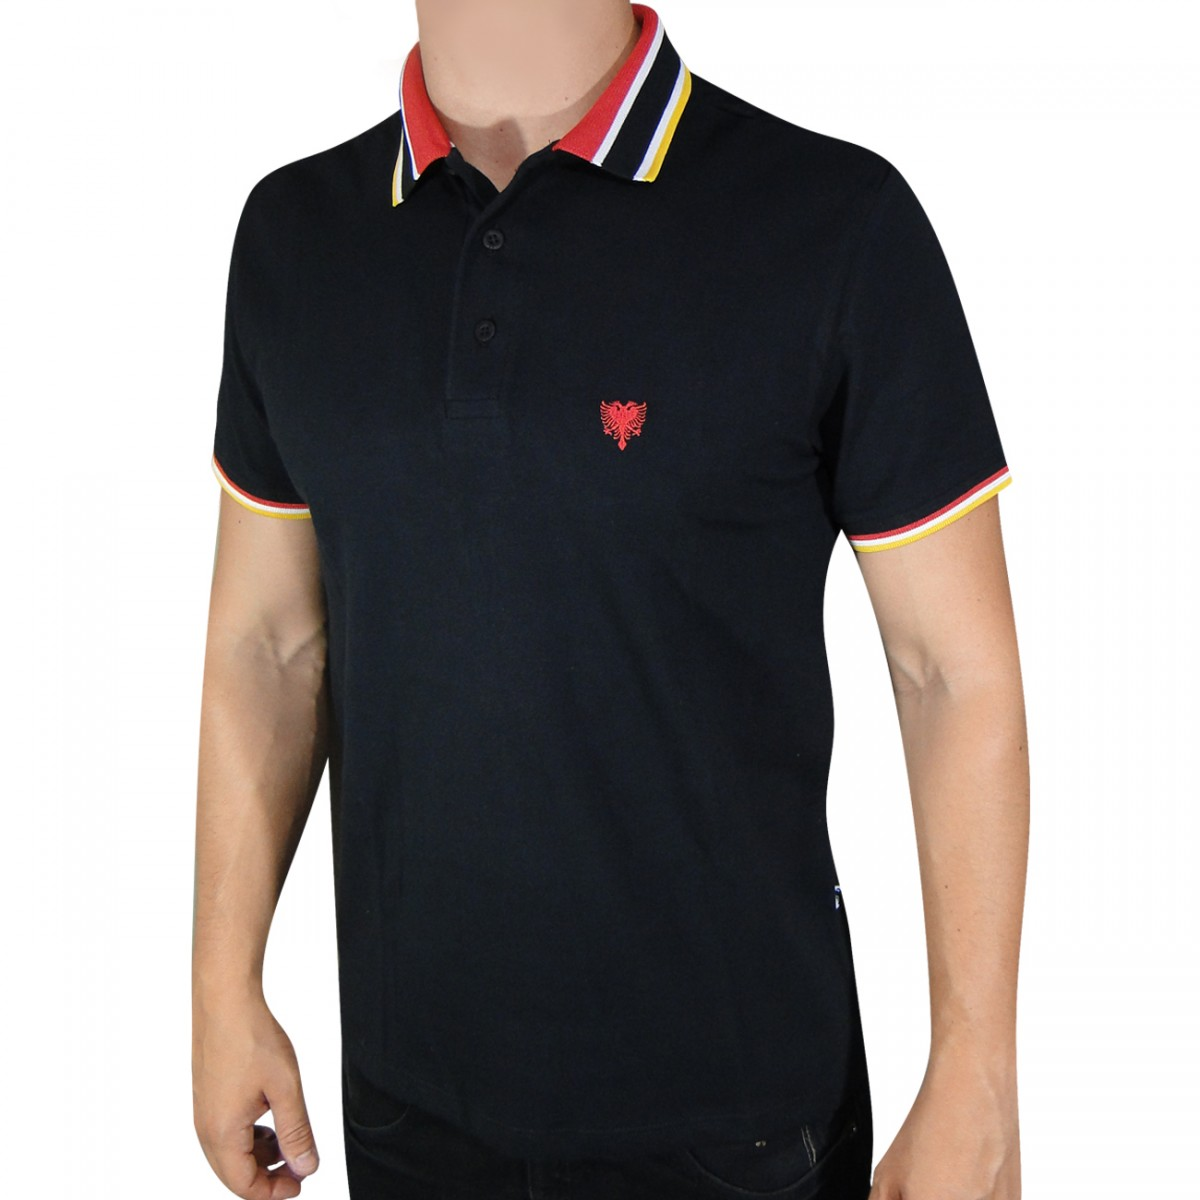 Camisa Polo Cavalera 0301 03.01.3824 - Preto - Chuteira Nike ada0ba64a0462